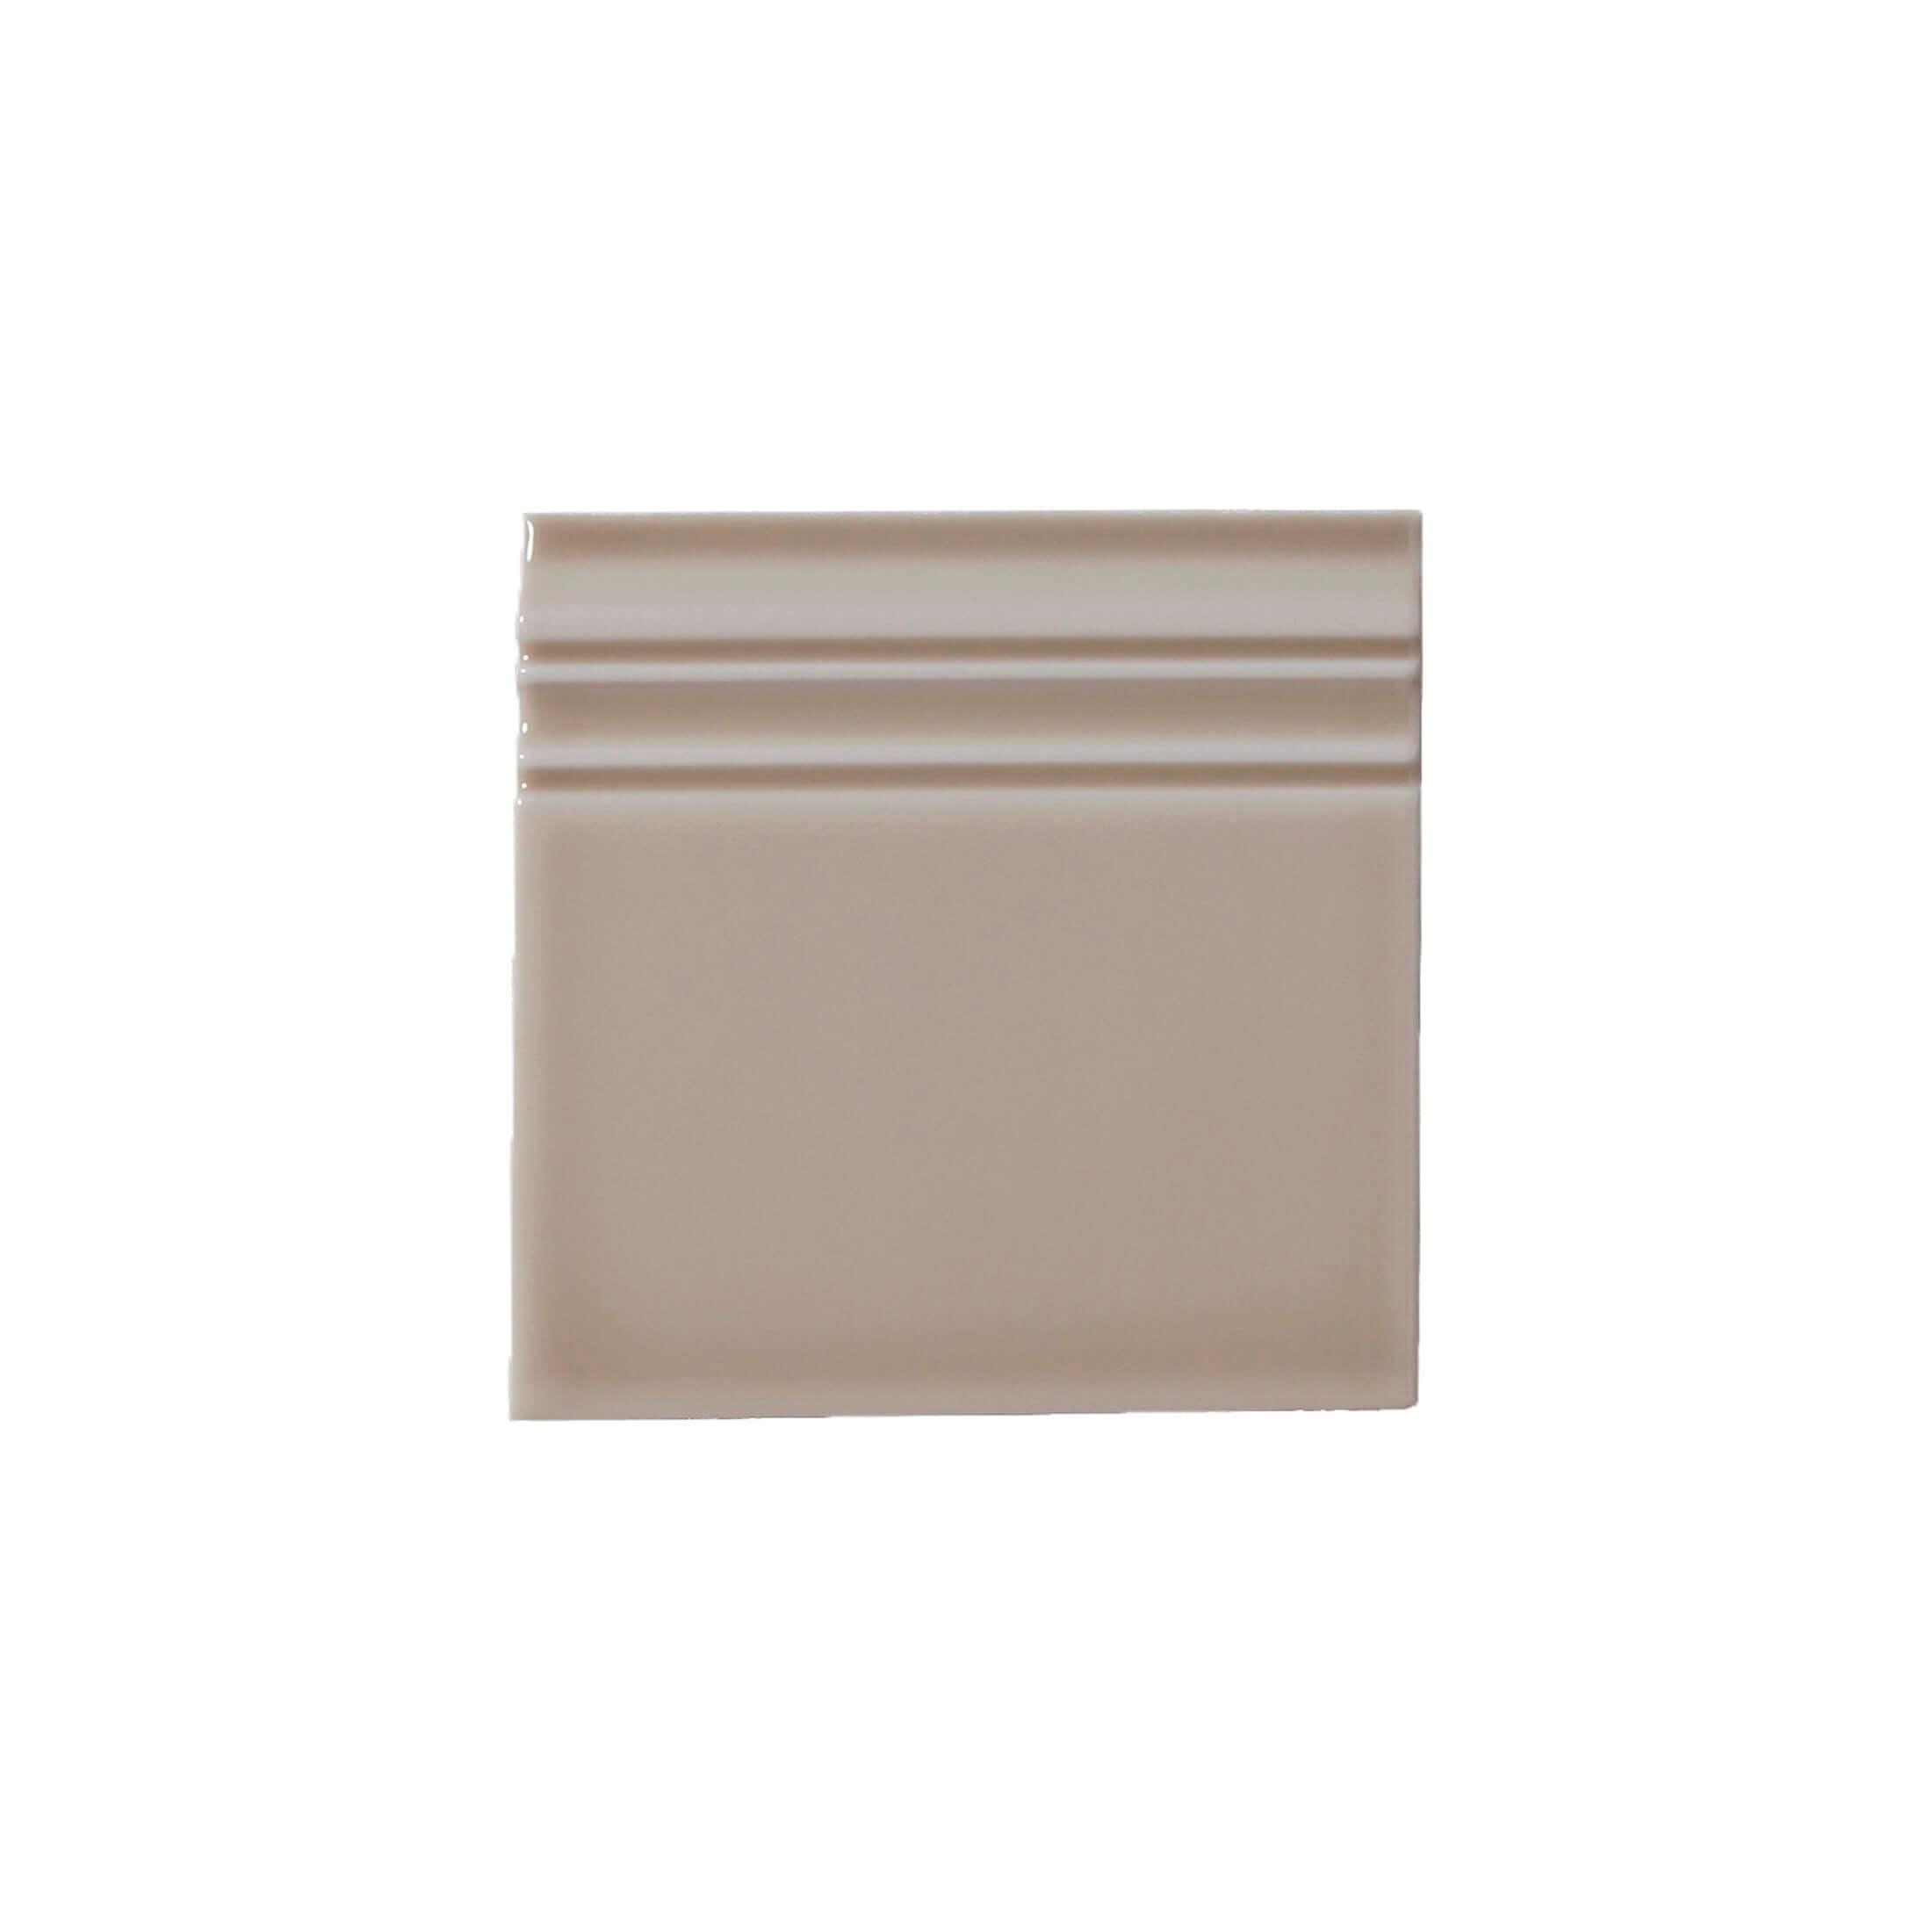 ADST5102 - RODAPIE  - 14.8 cm X 14.8 cm